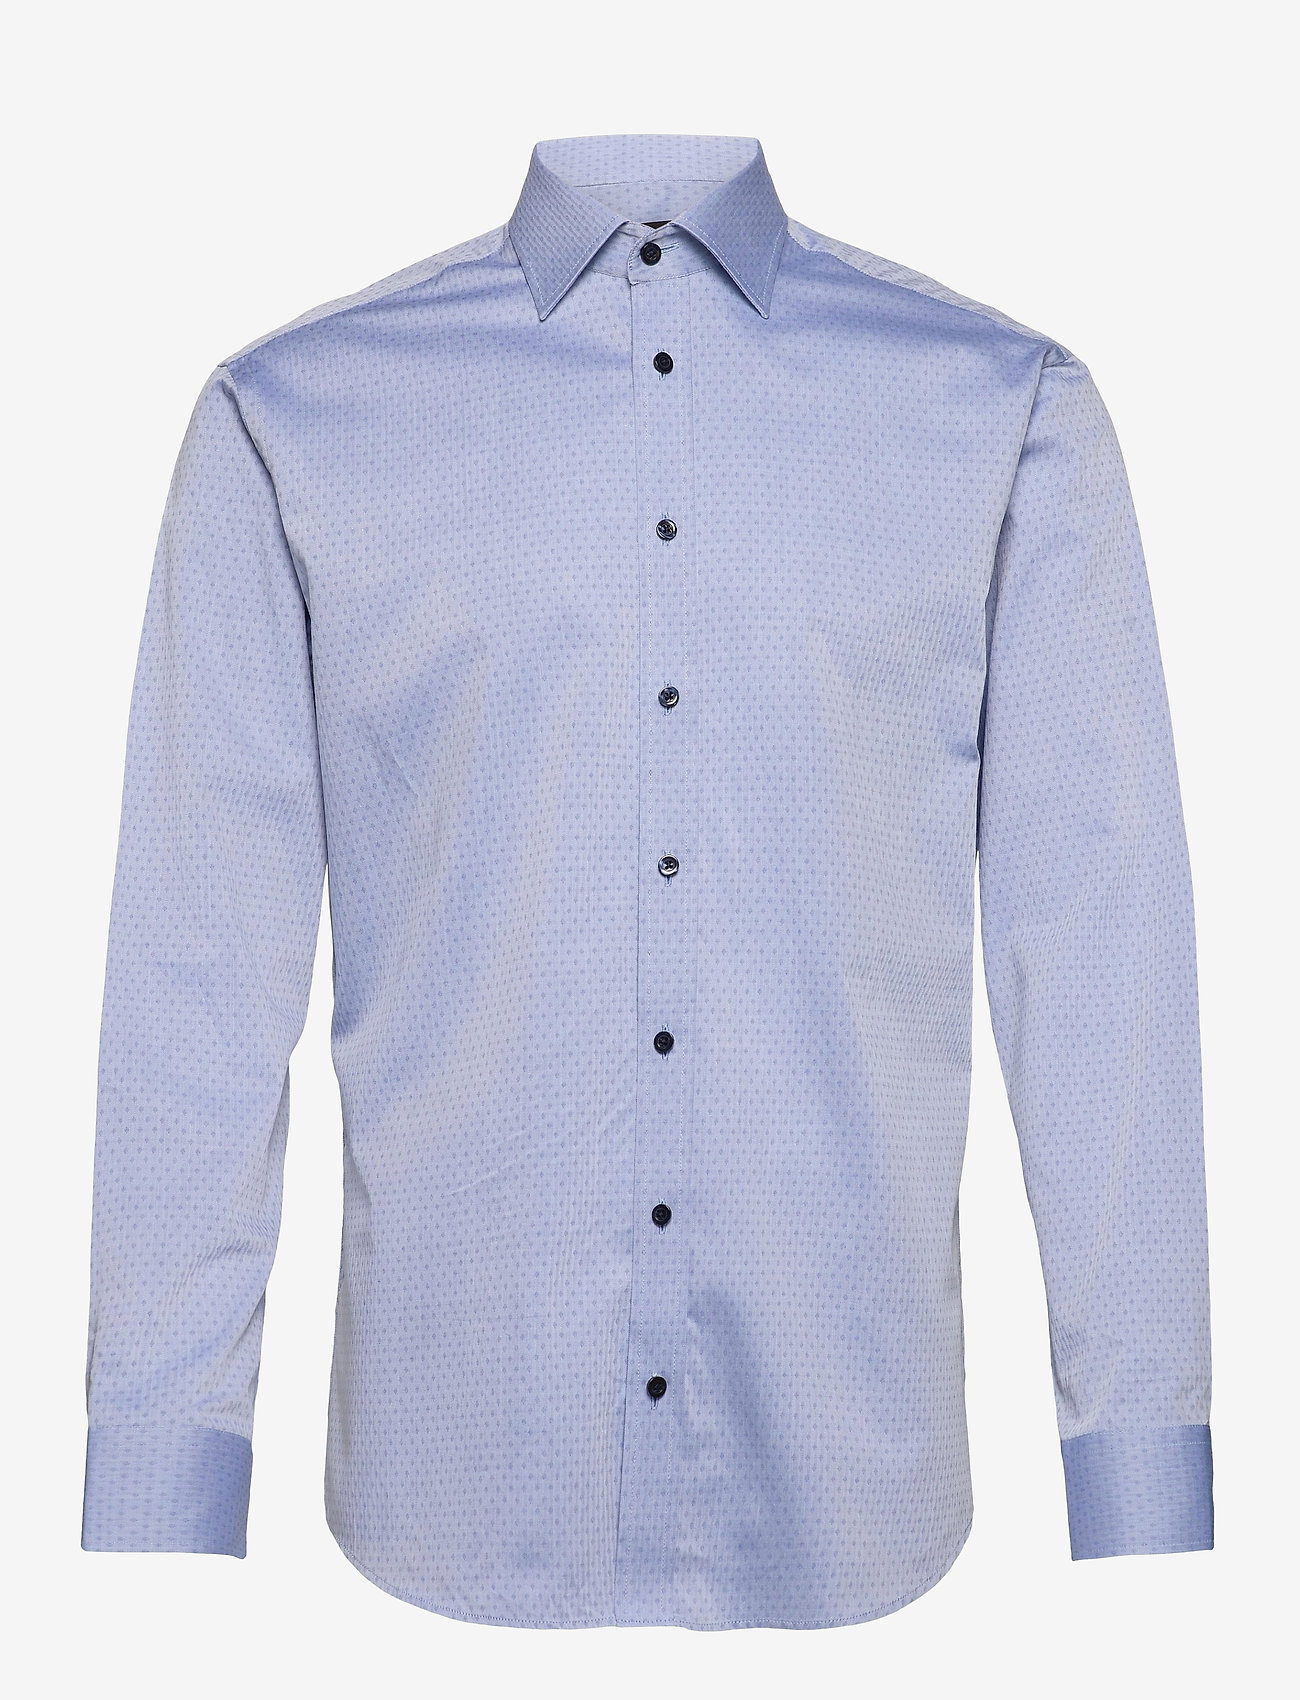 Bosweel Shirts Est. 1937 - Modern fit - chemises d'affaires - light blue - 0